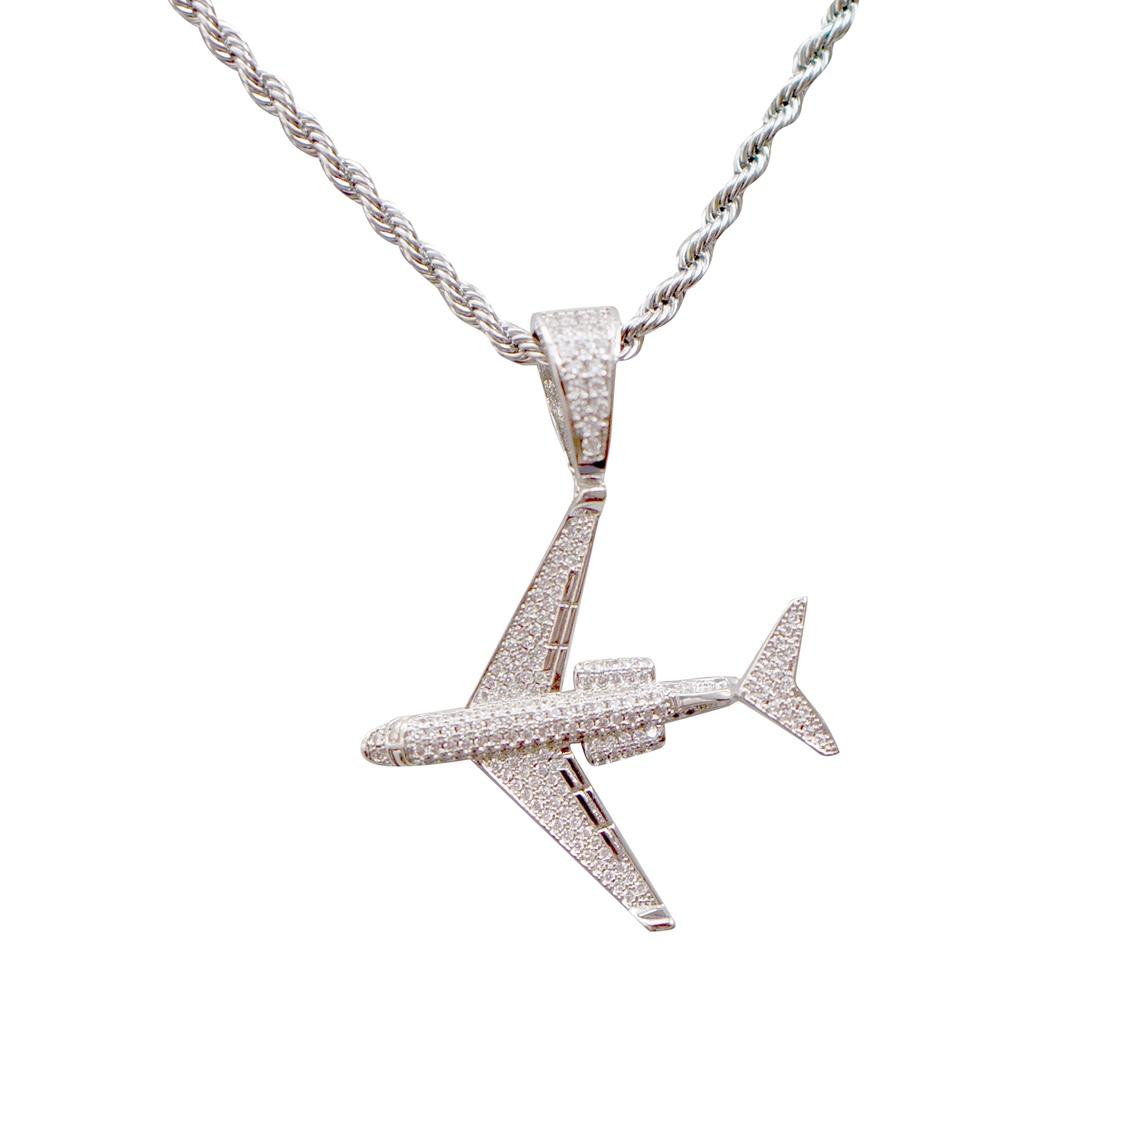 Flyhood take-off and landing safety civil aviation original design hip hop jewelry diamond aircraft Necklace